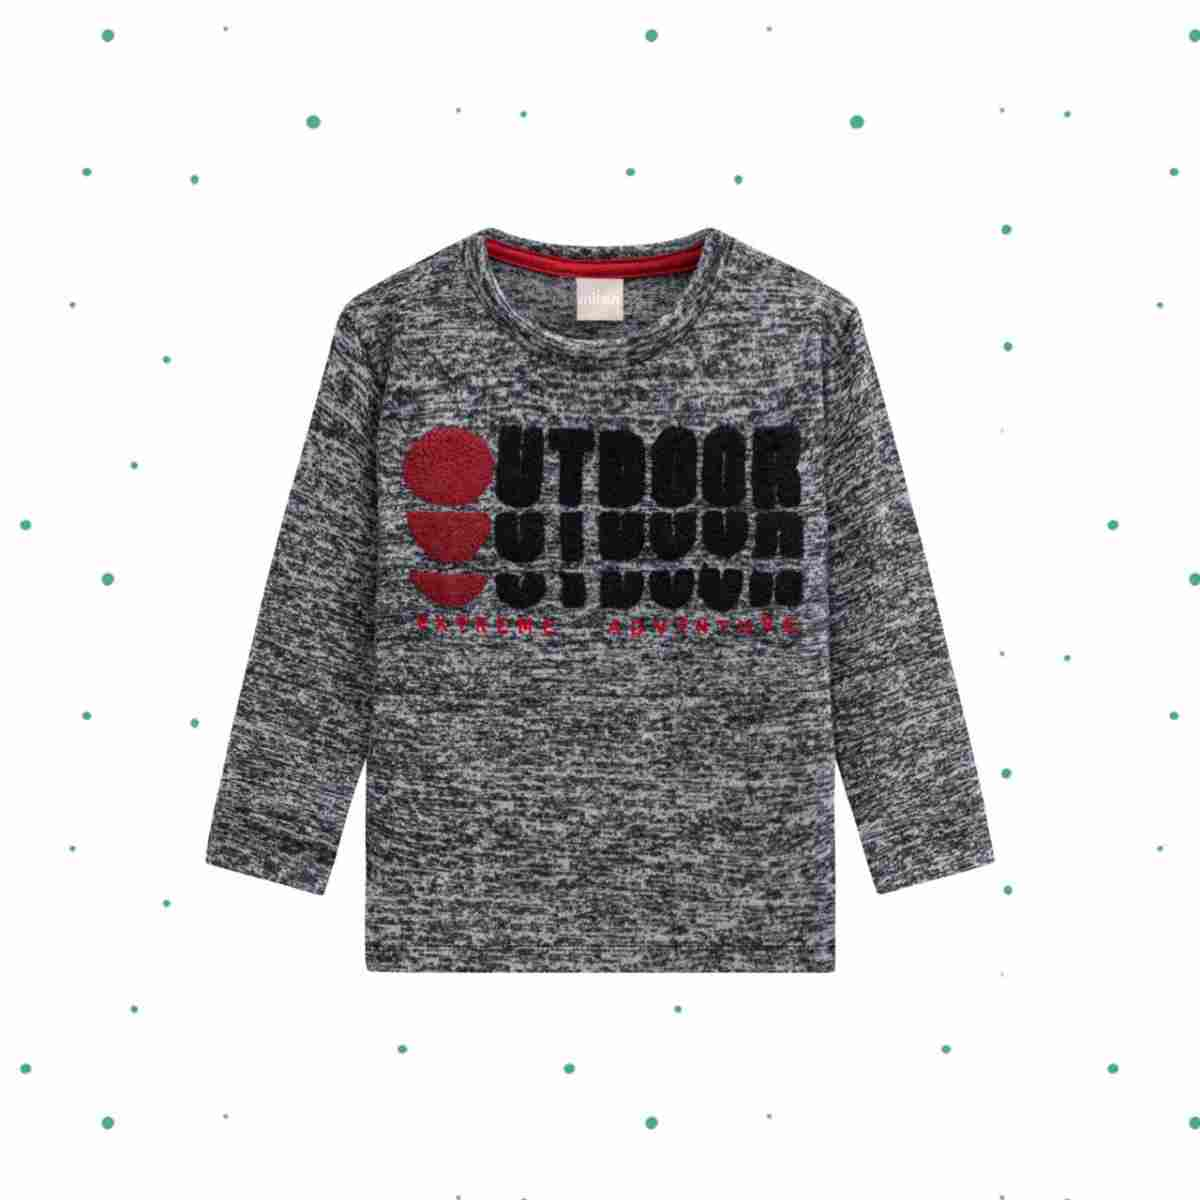 Camiseta Manga Longa Menino Milon em Tricot Vanizada